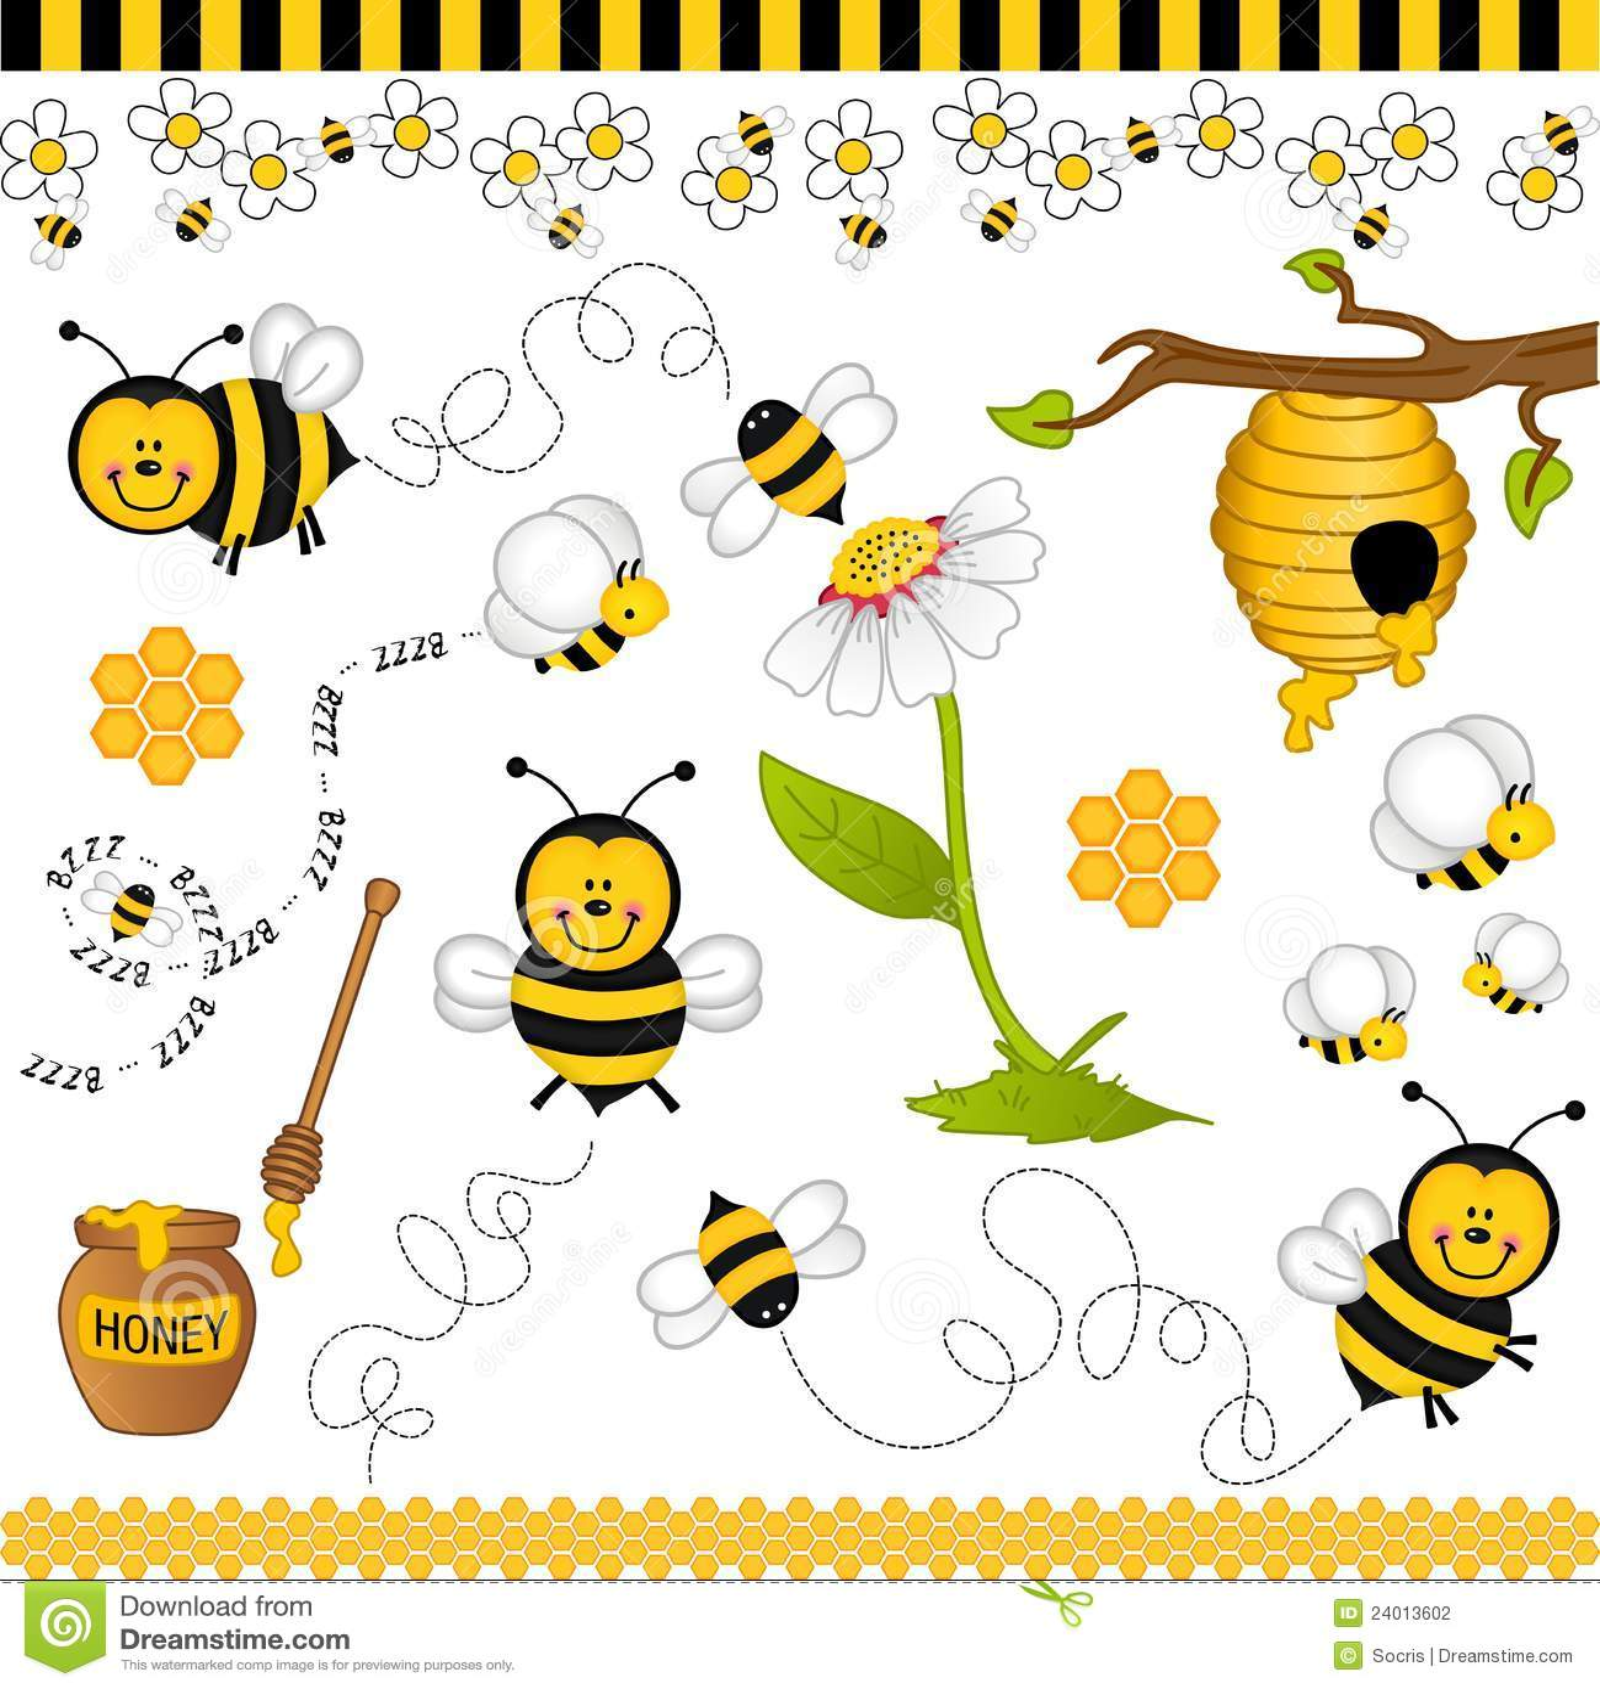 Пчелы и мед картинки